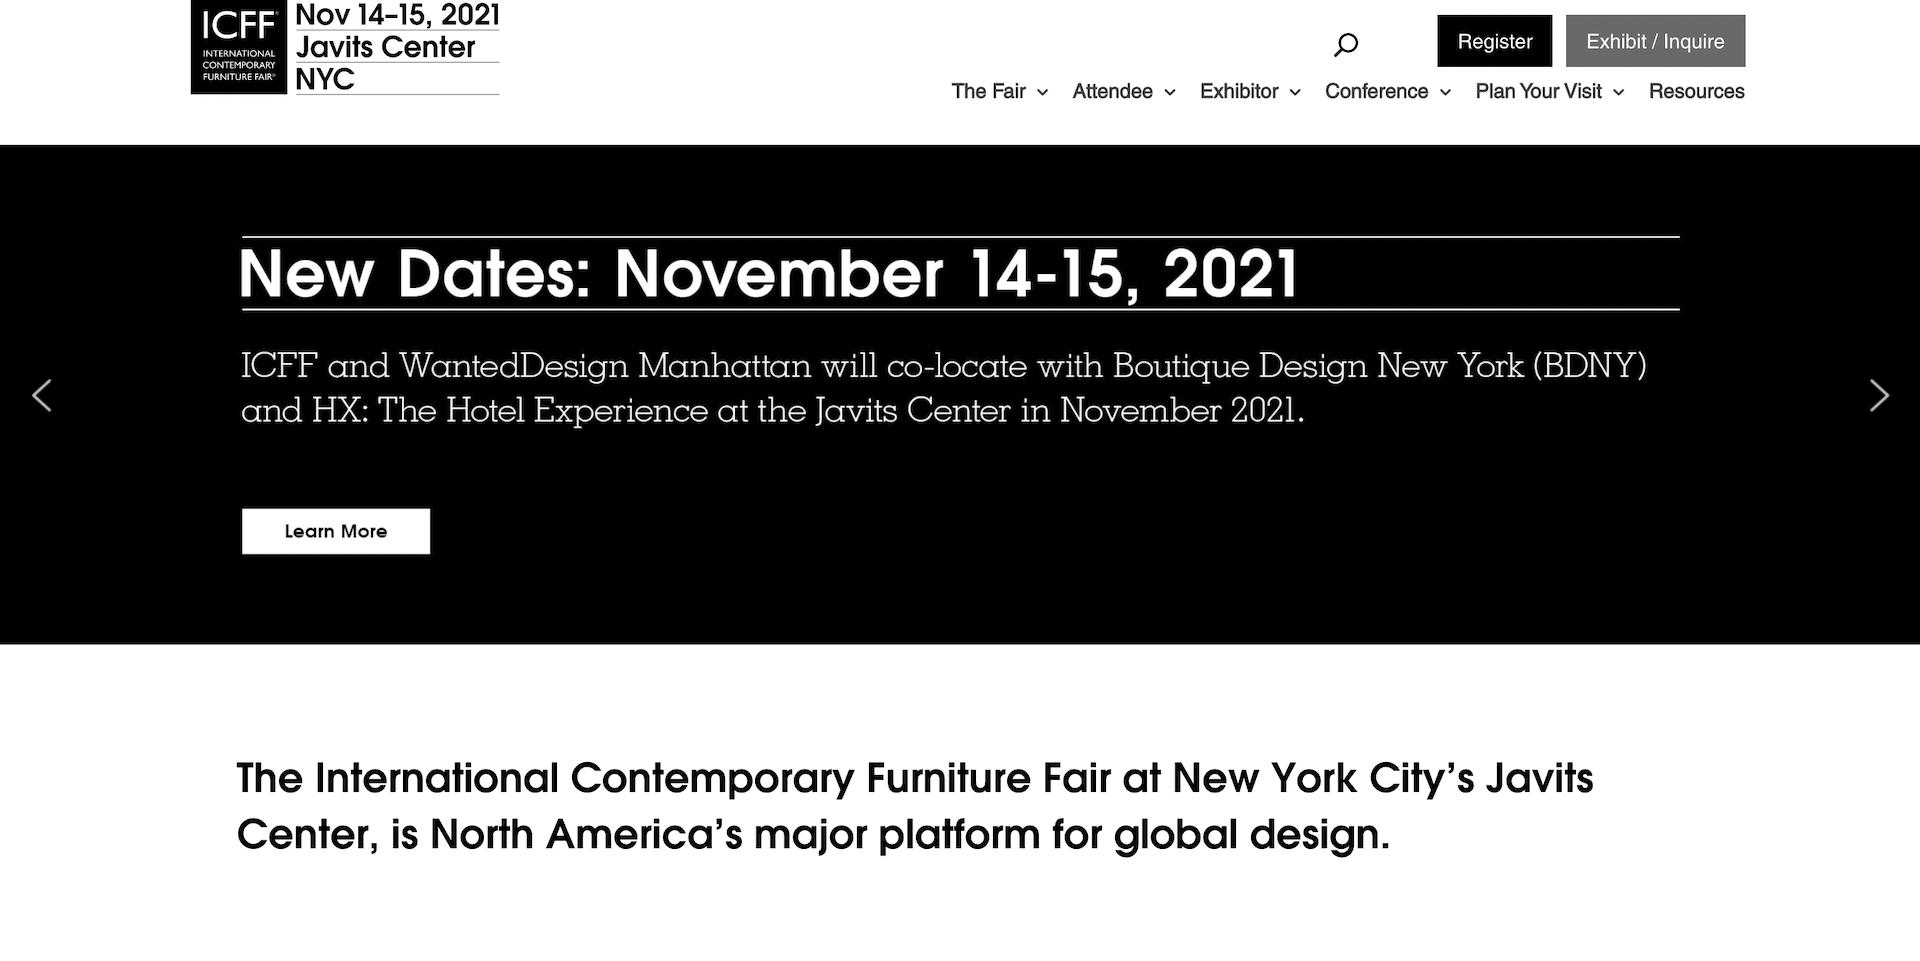 Top Interior Design Exhibitions: ICFF